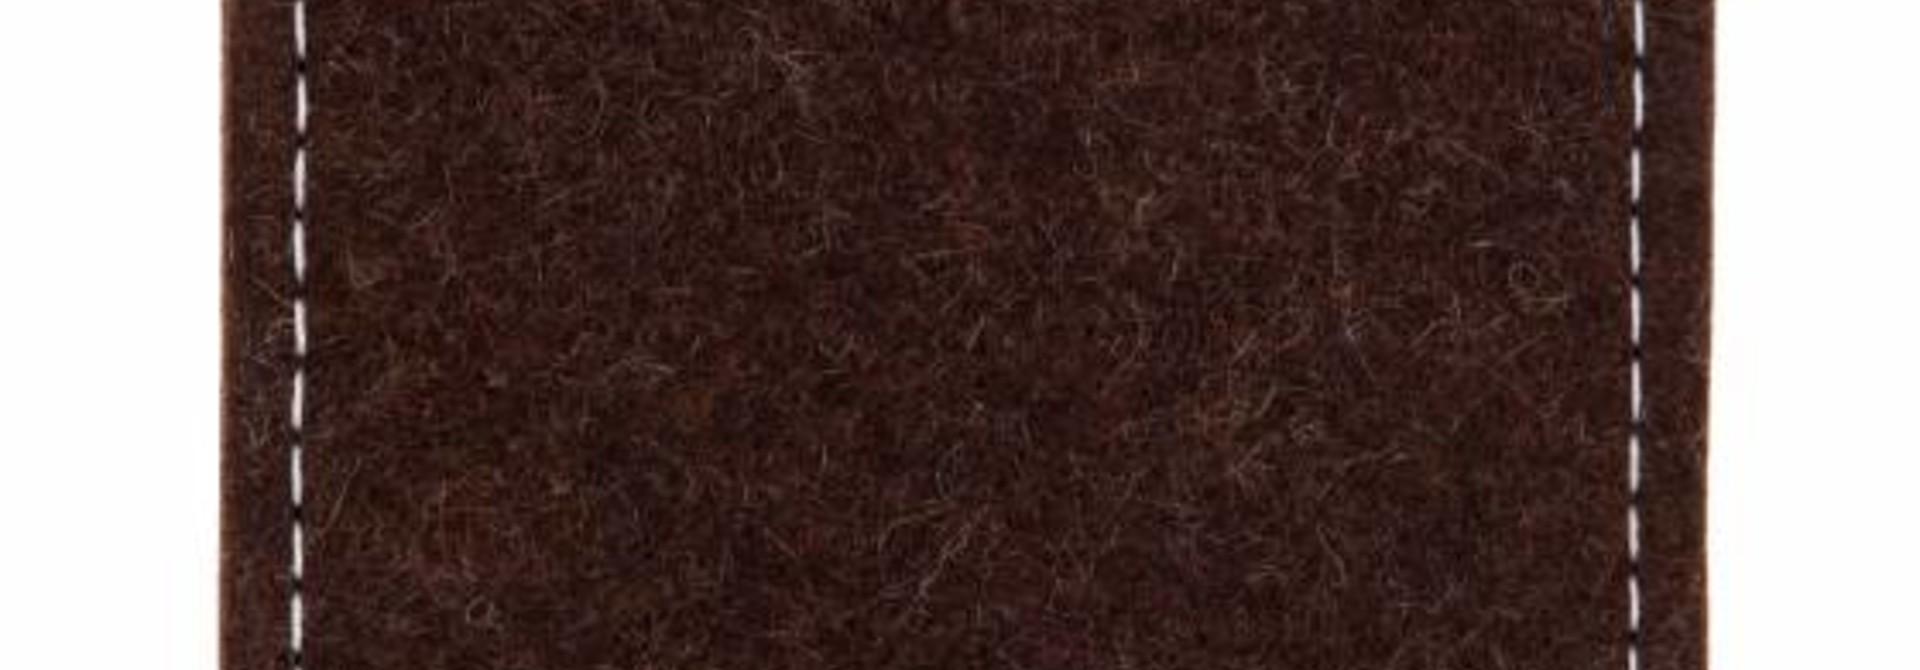 U / Desire / One Sleeve Truffle-Brown